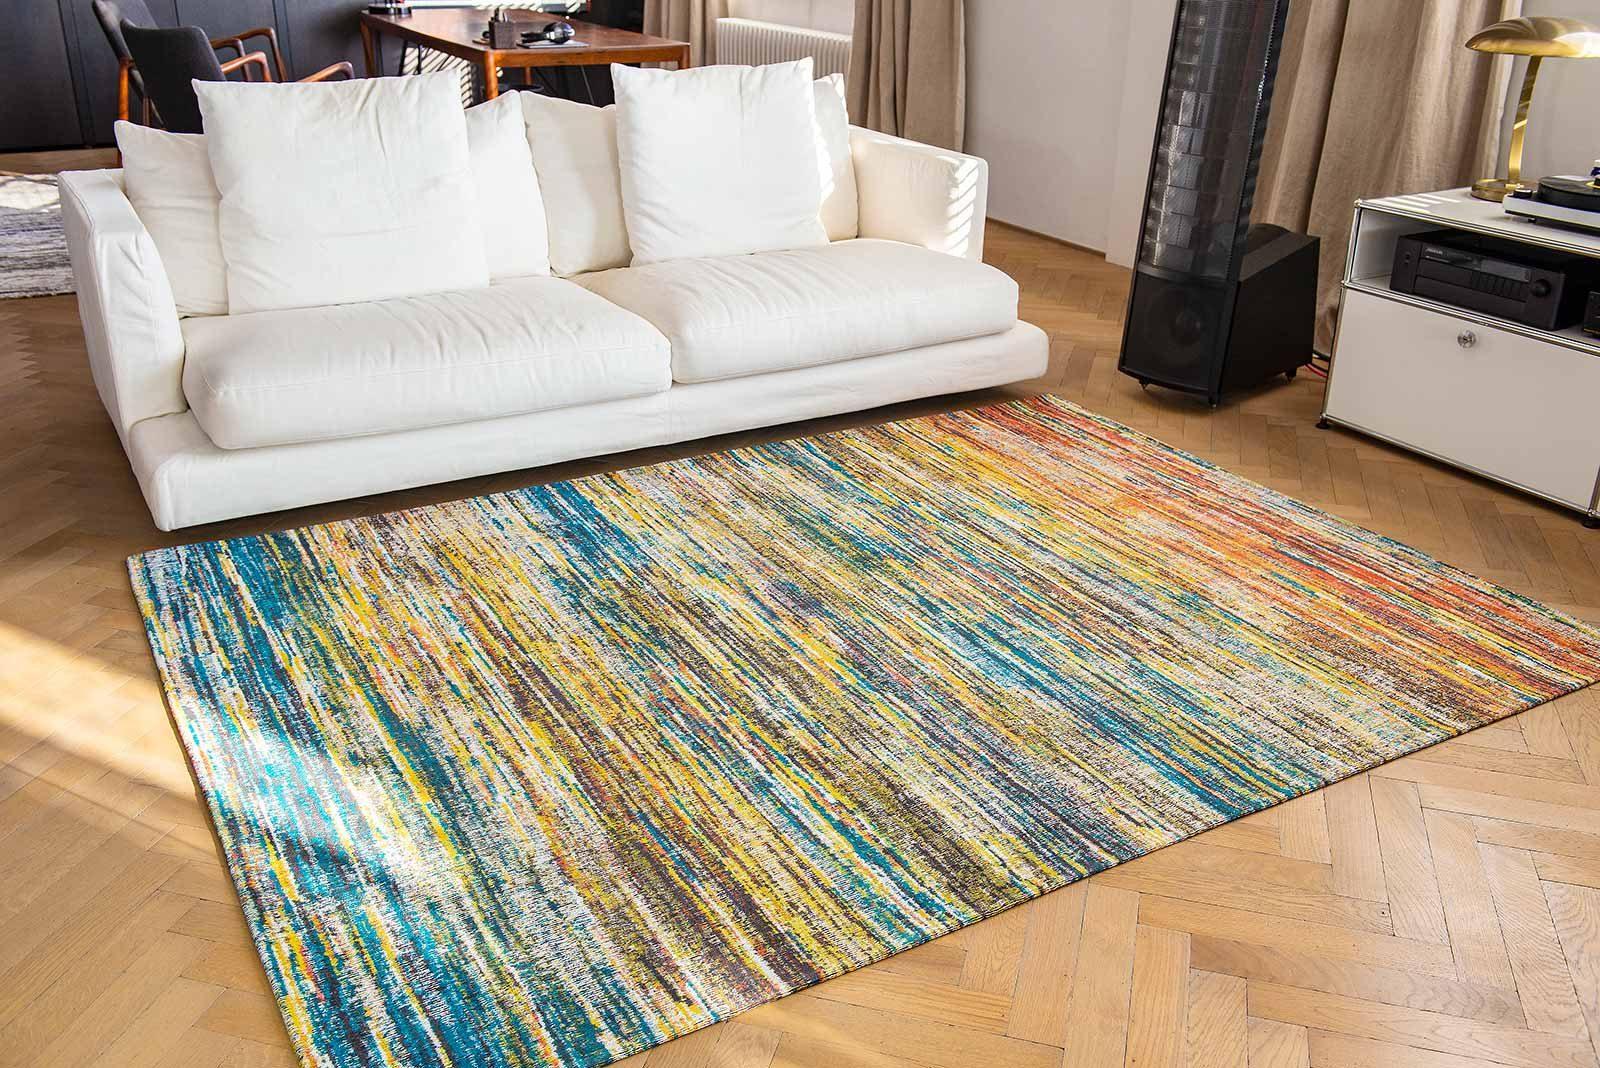 vloerkleed Louis De Poortere LX 8871 Sari Myriad interior